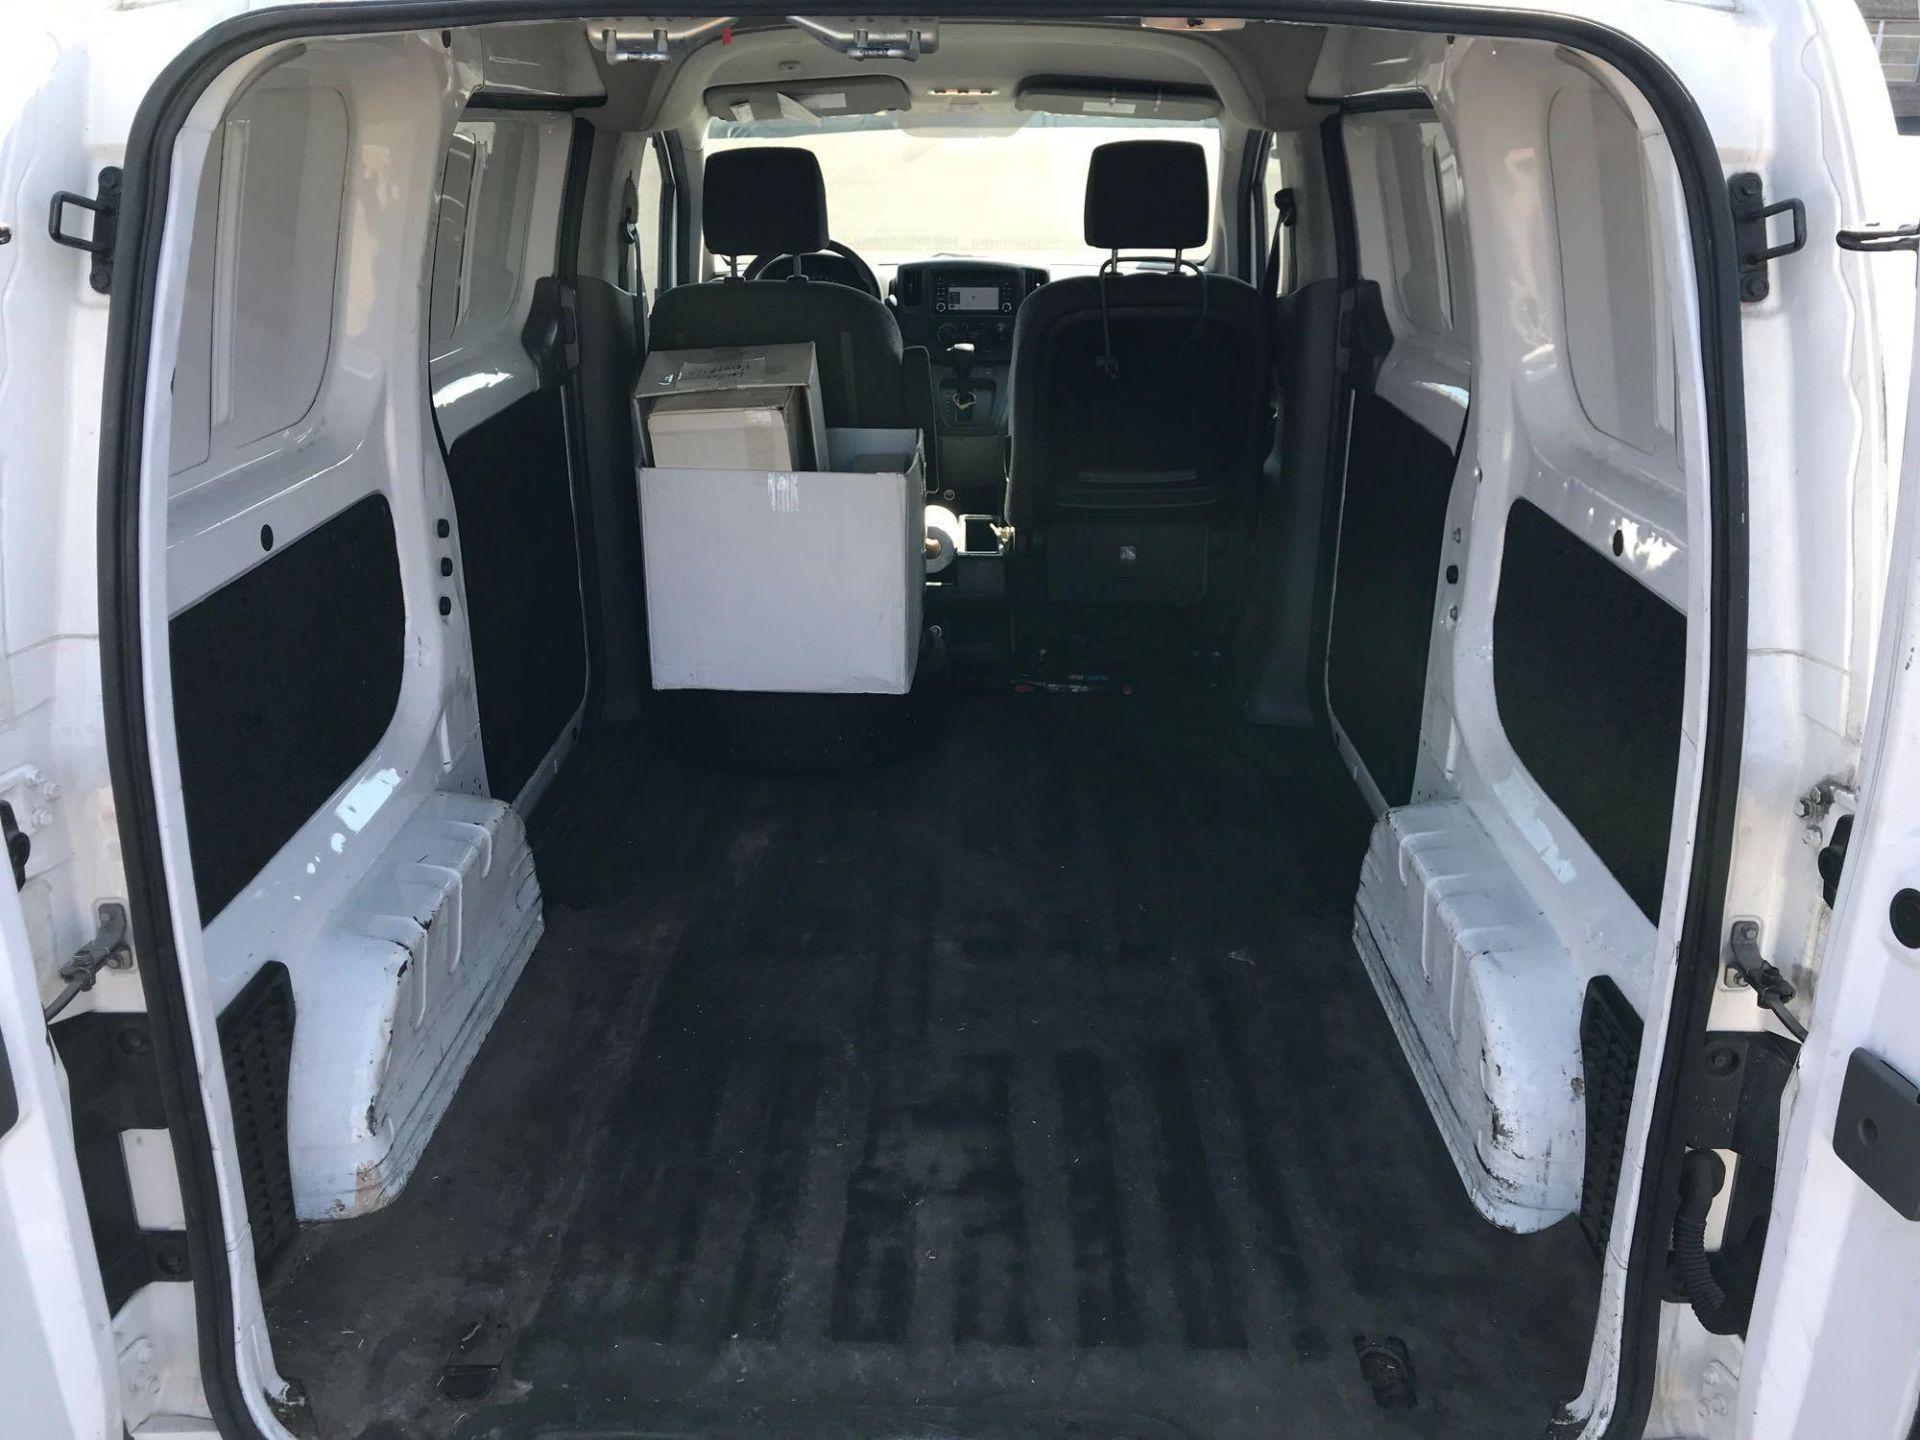 2013 Nissan NV200 Delivery Van - Image 29 of 54